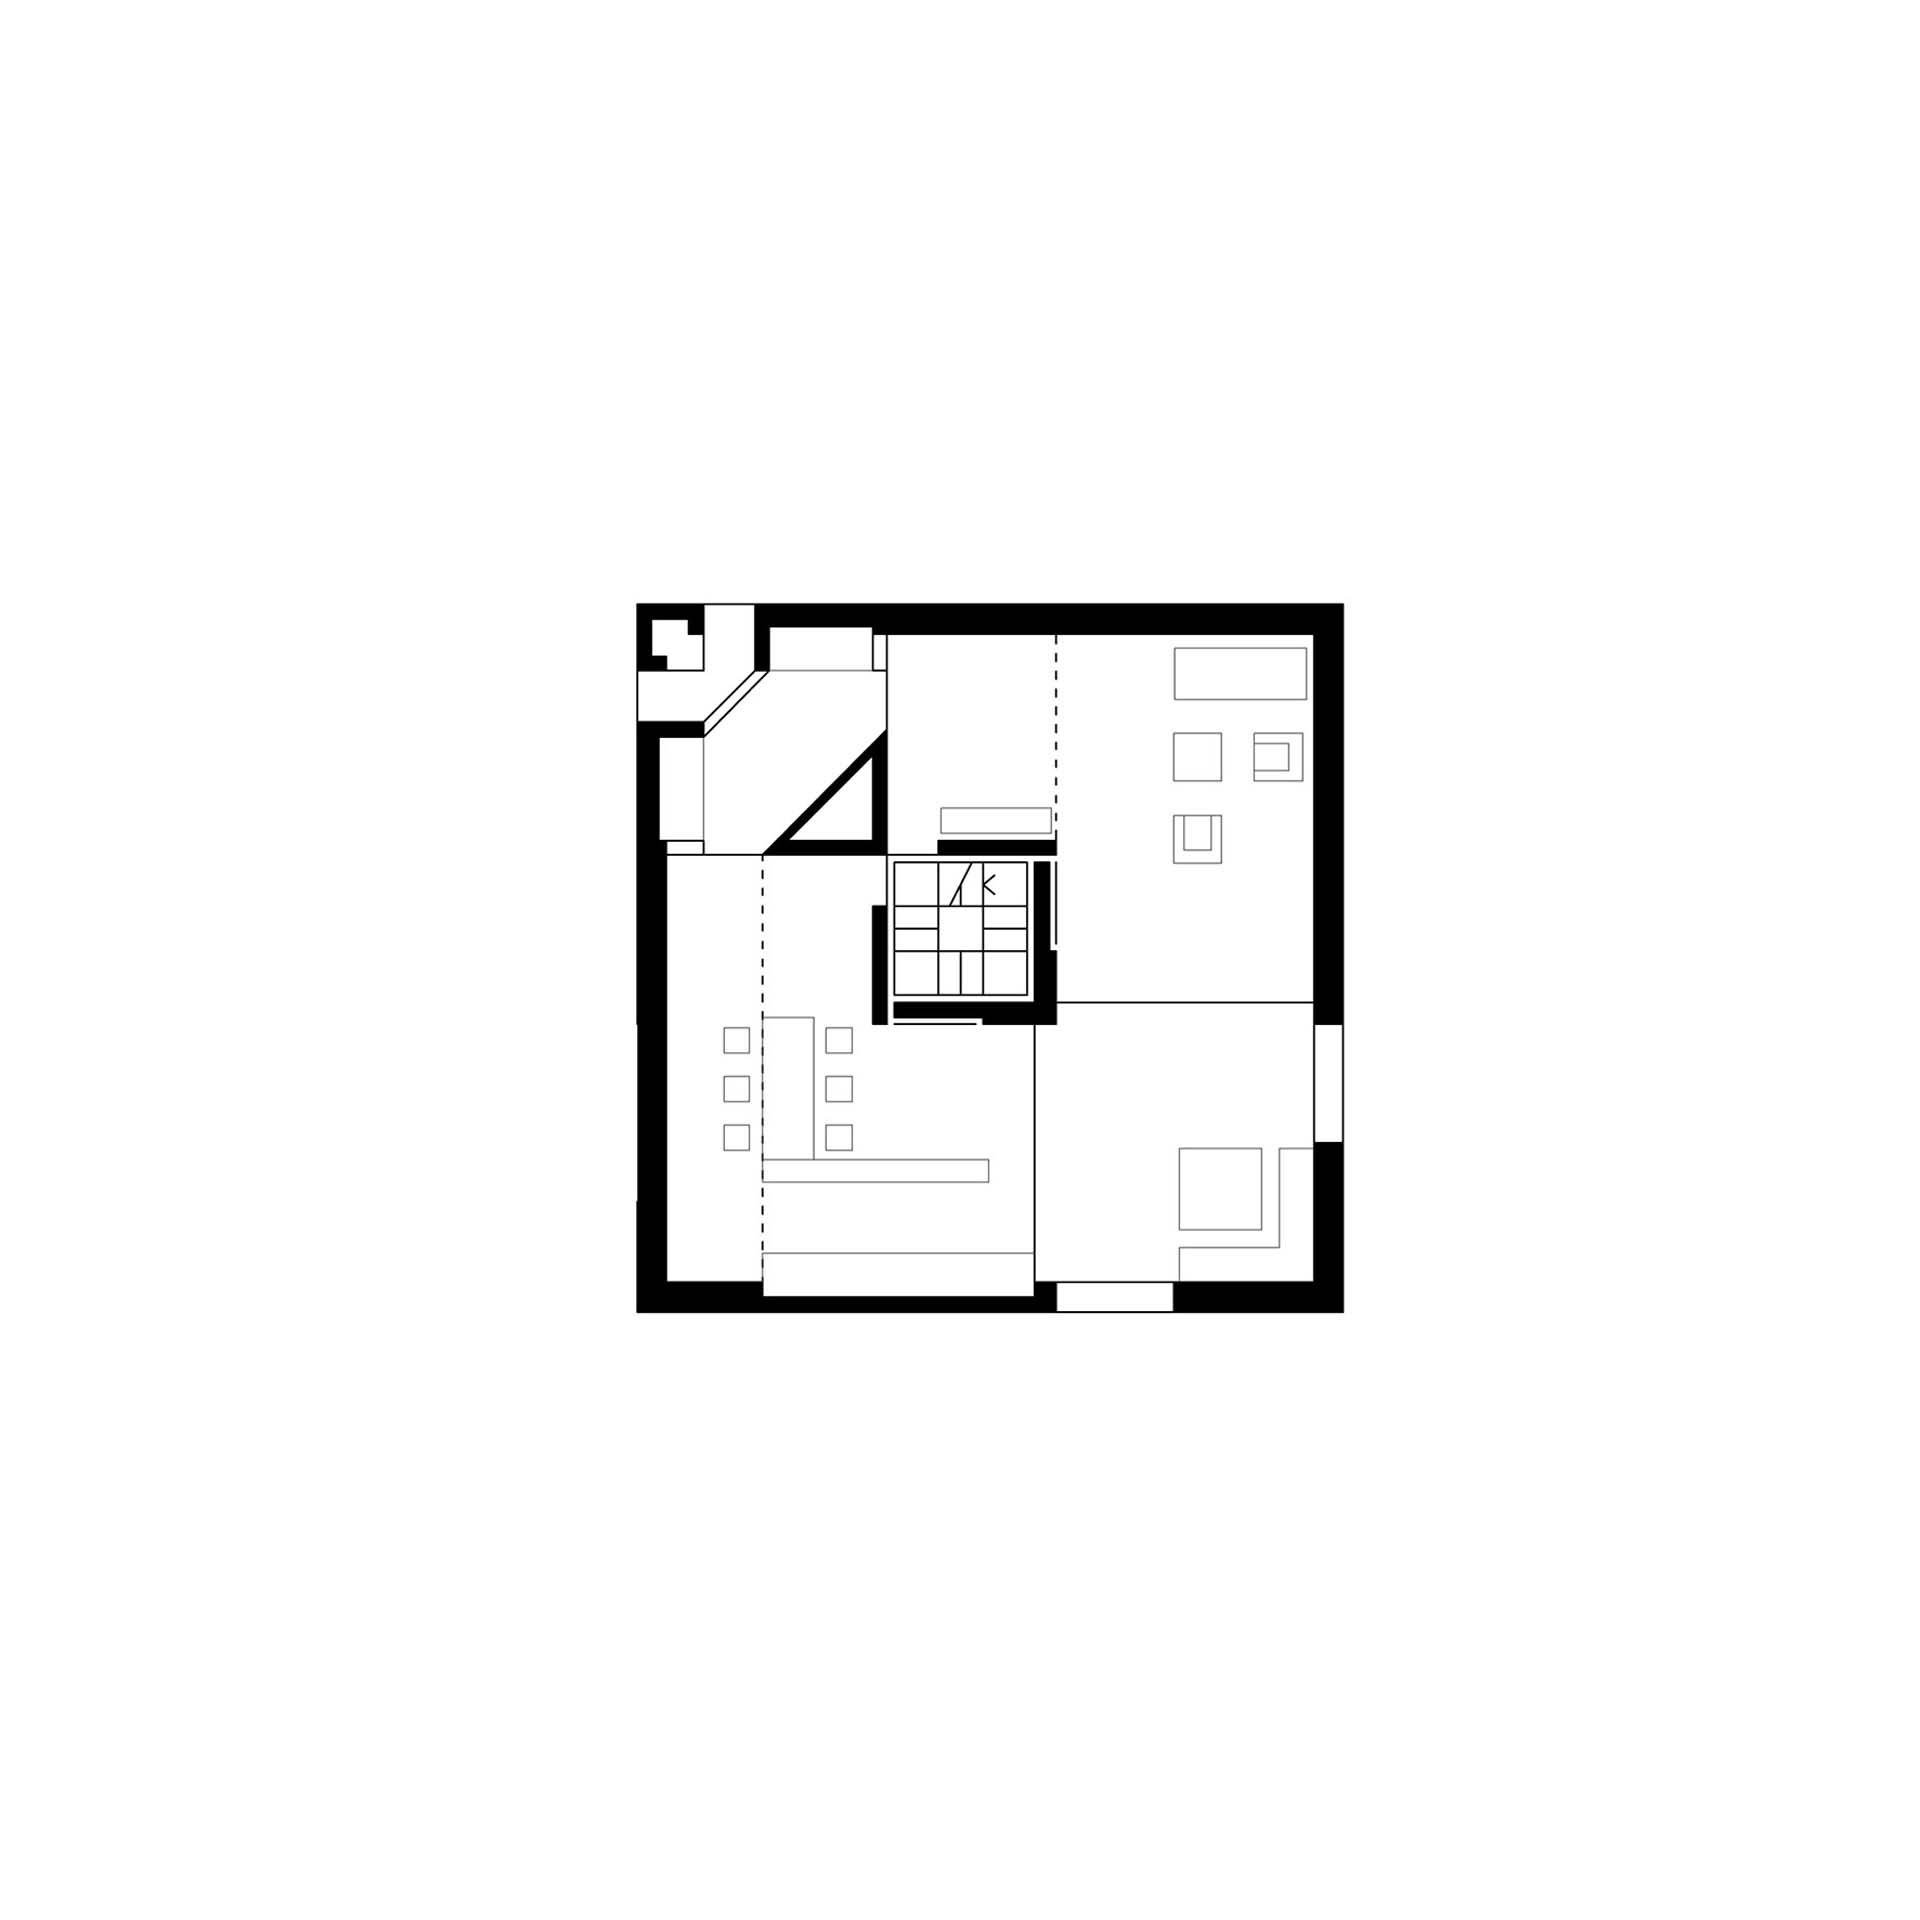 House At Riva San Vitale Site Plan House Plans